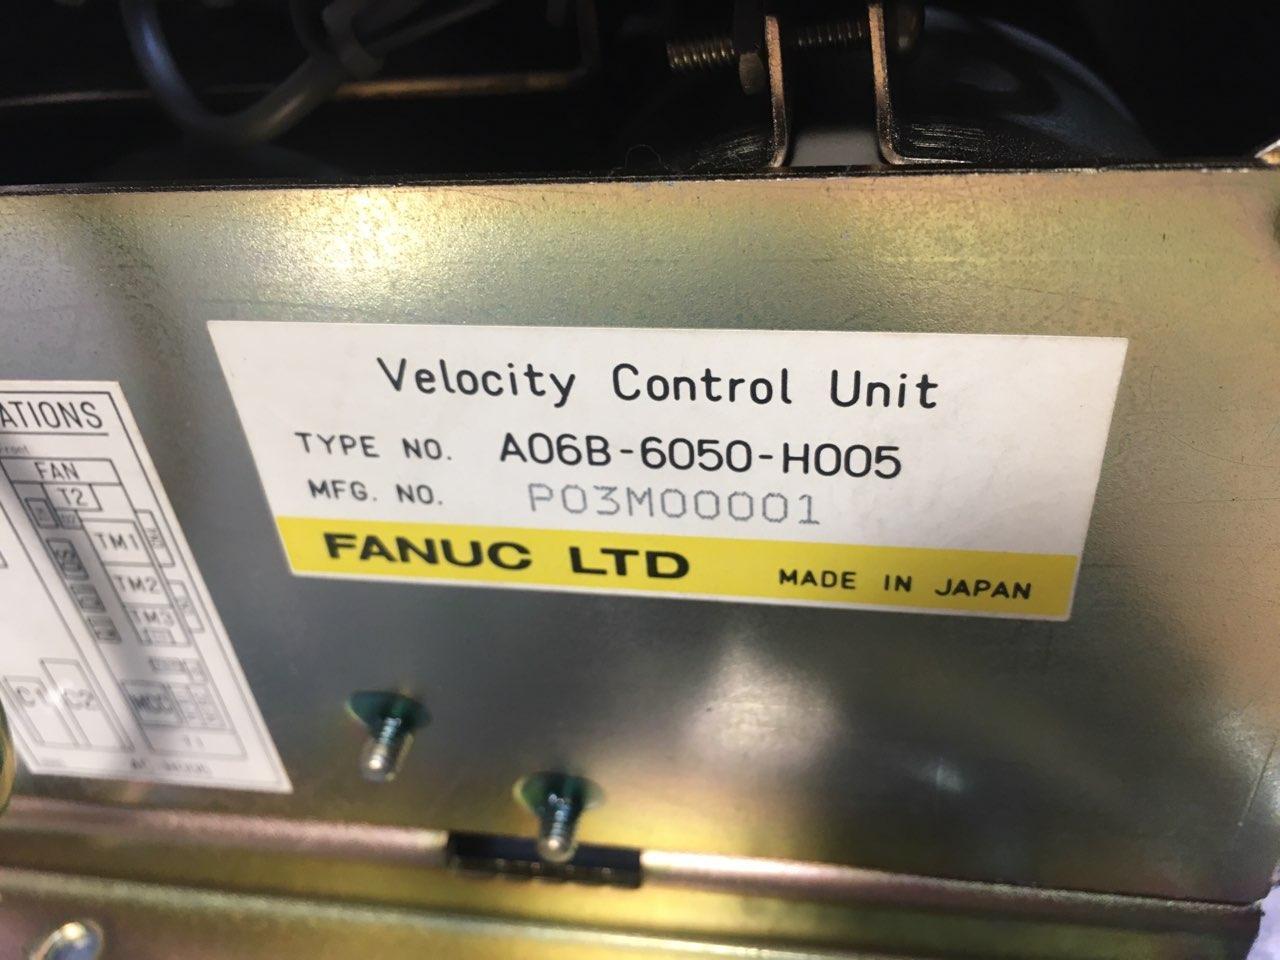 FANUC A06B-6050-H005 VELOCITY CONTROL UNIT with A20B-1000-0560/11F Top Board.